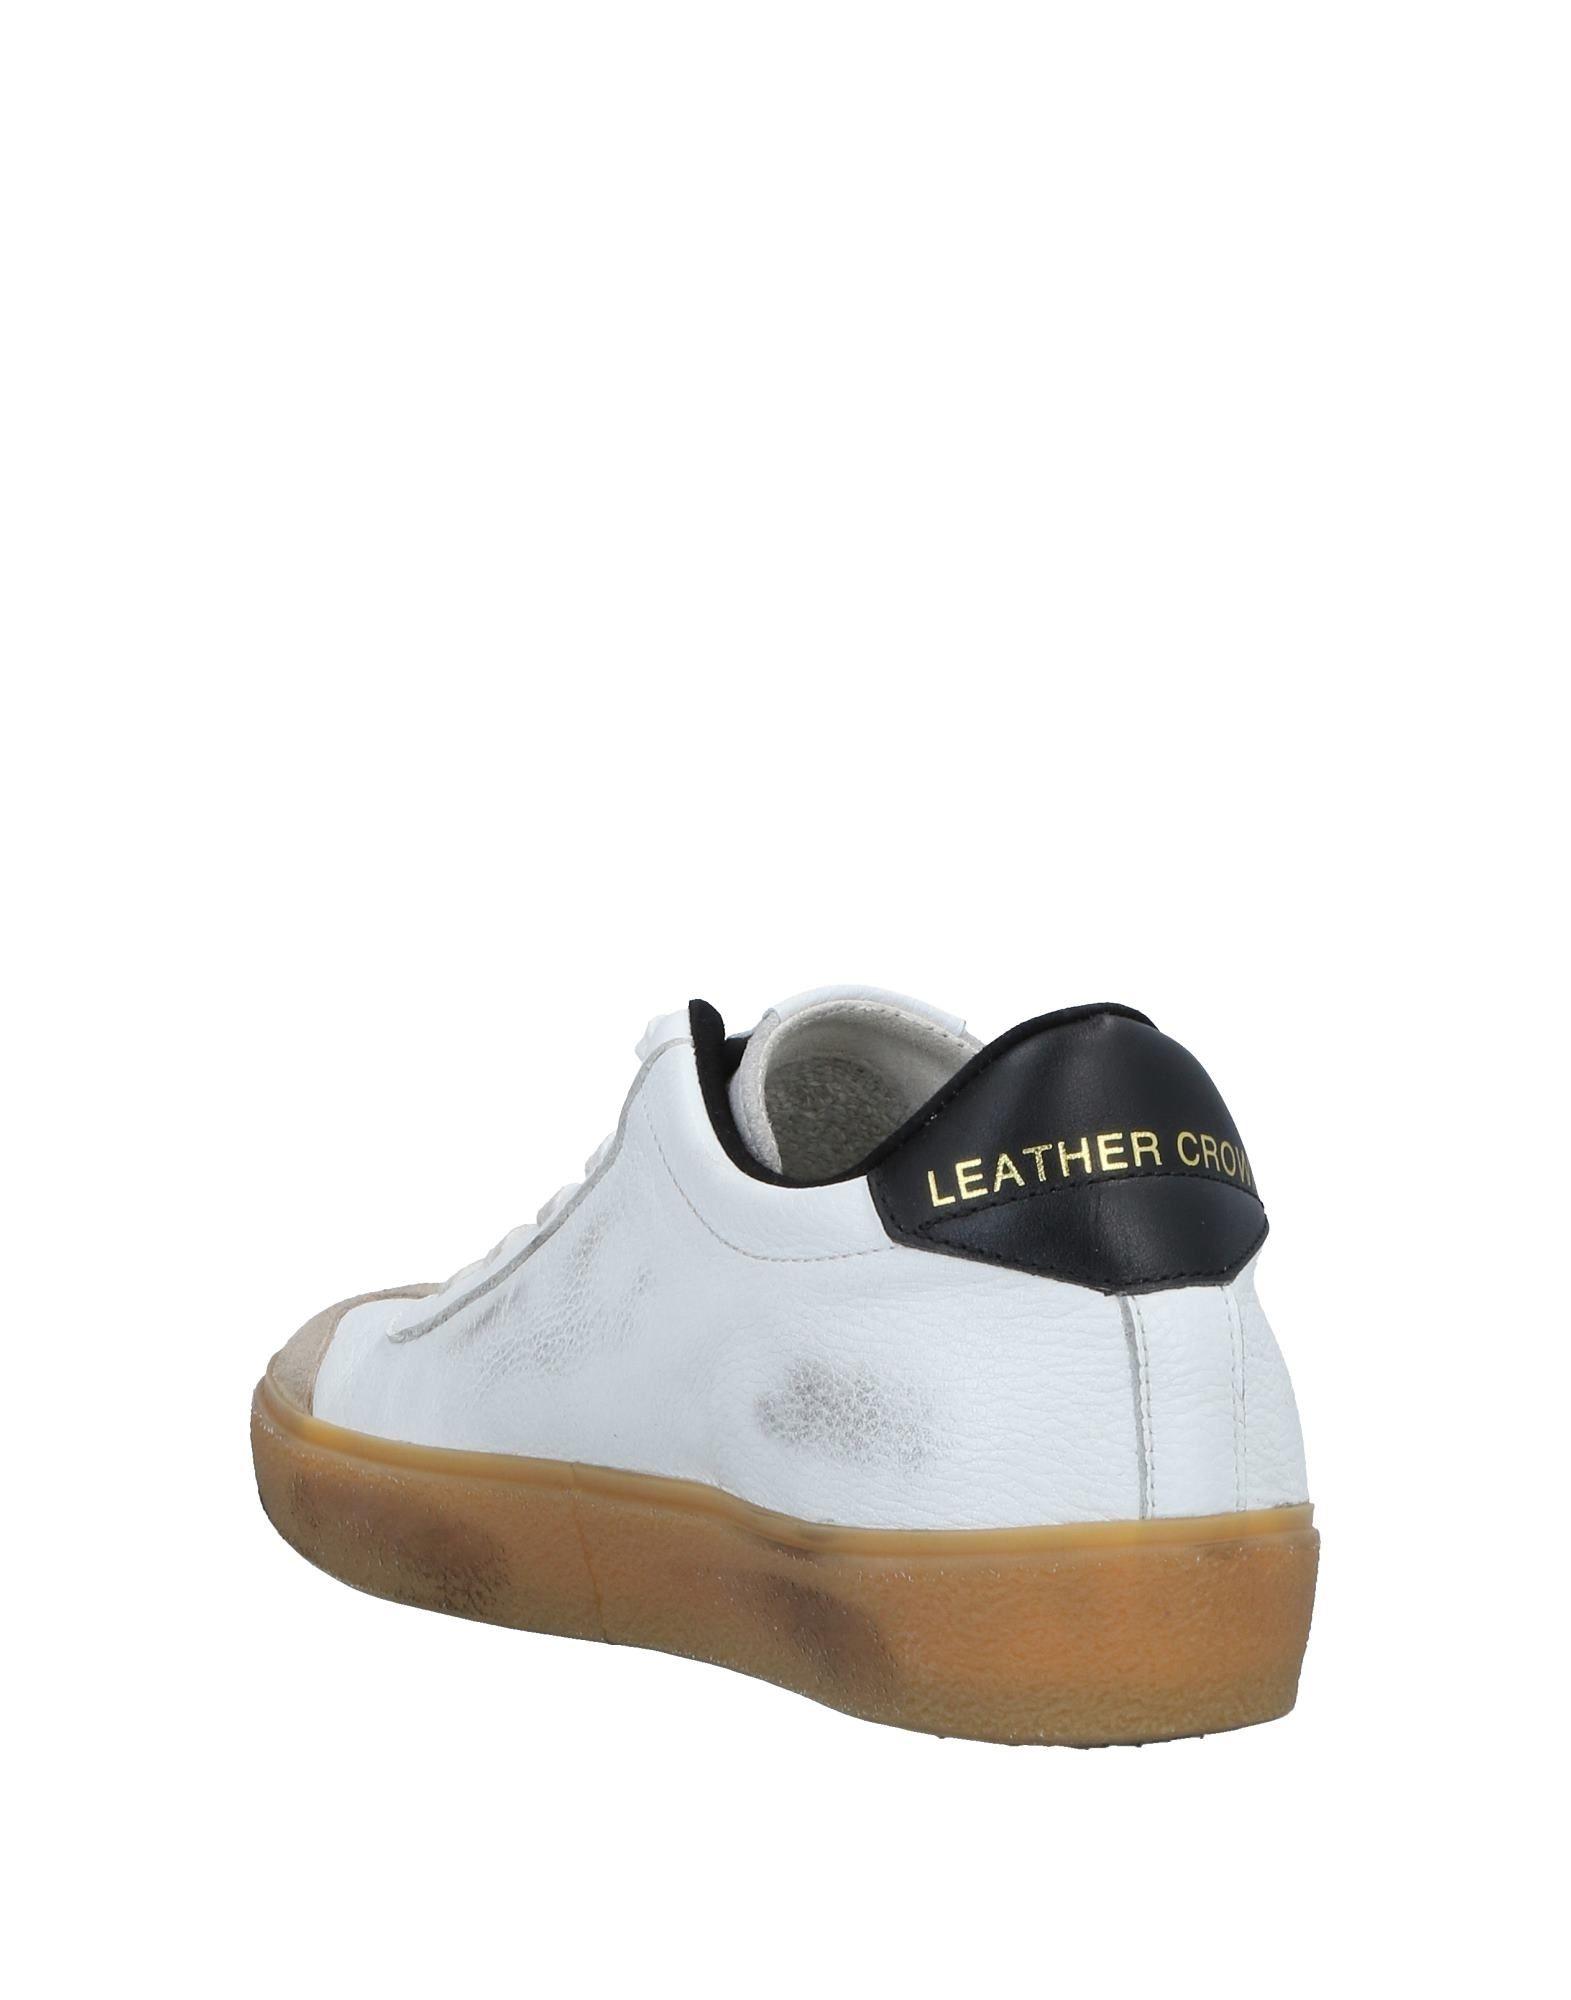 Stilvolle billige Schuhe Damen Leather Crown Sneakers Damen Schuhe  11531813RU bef612